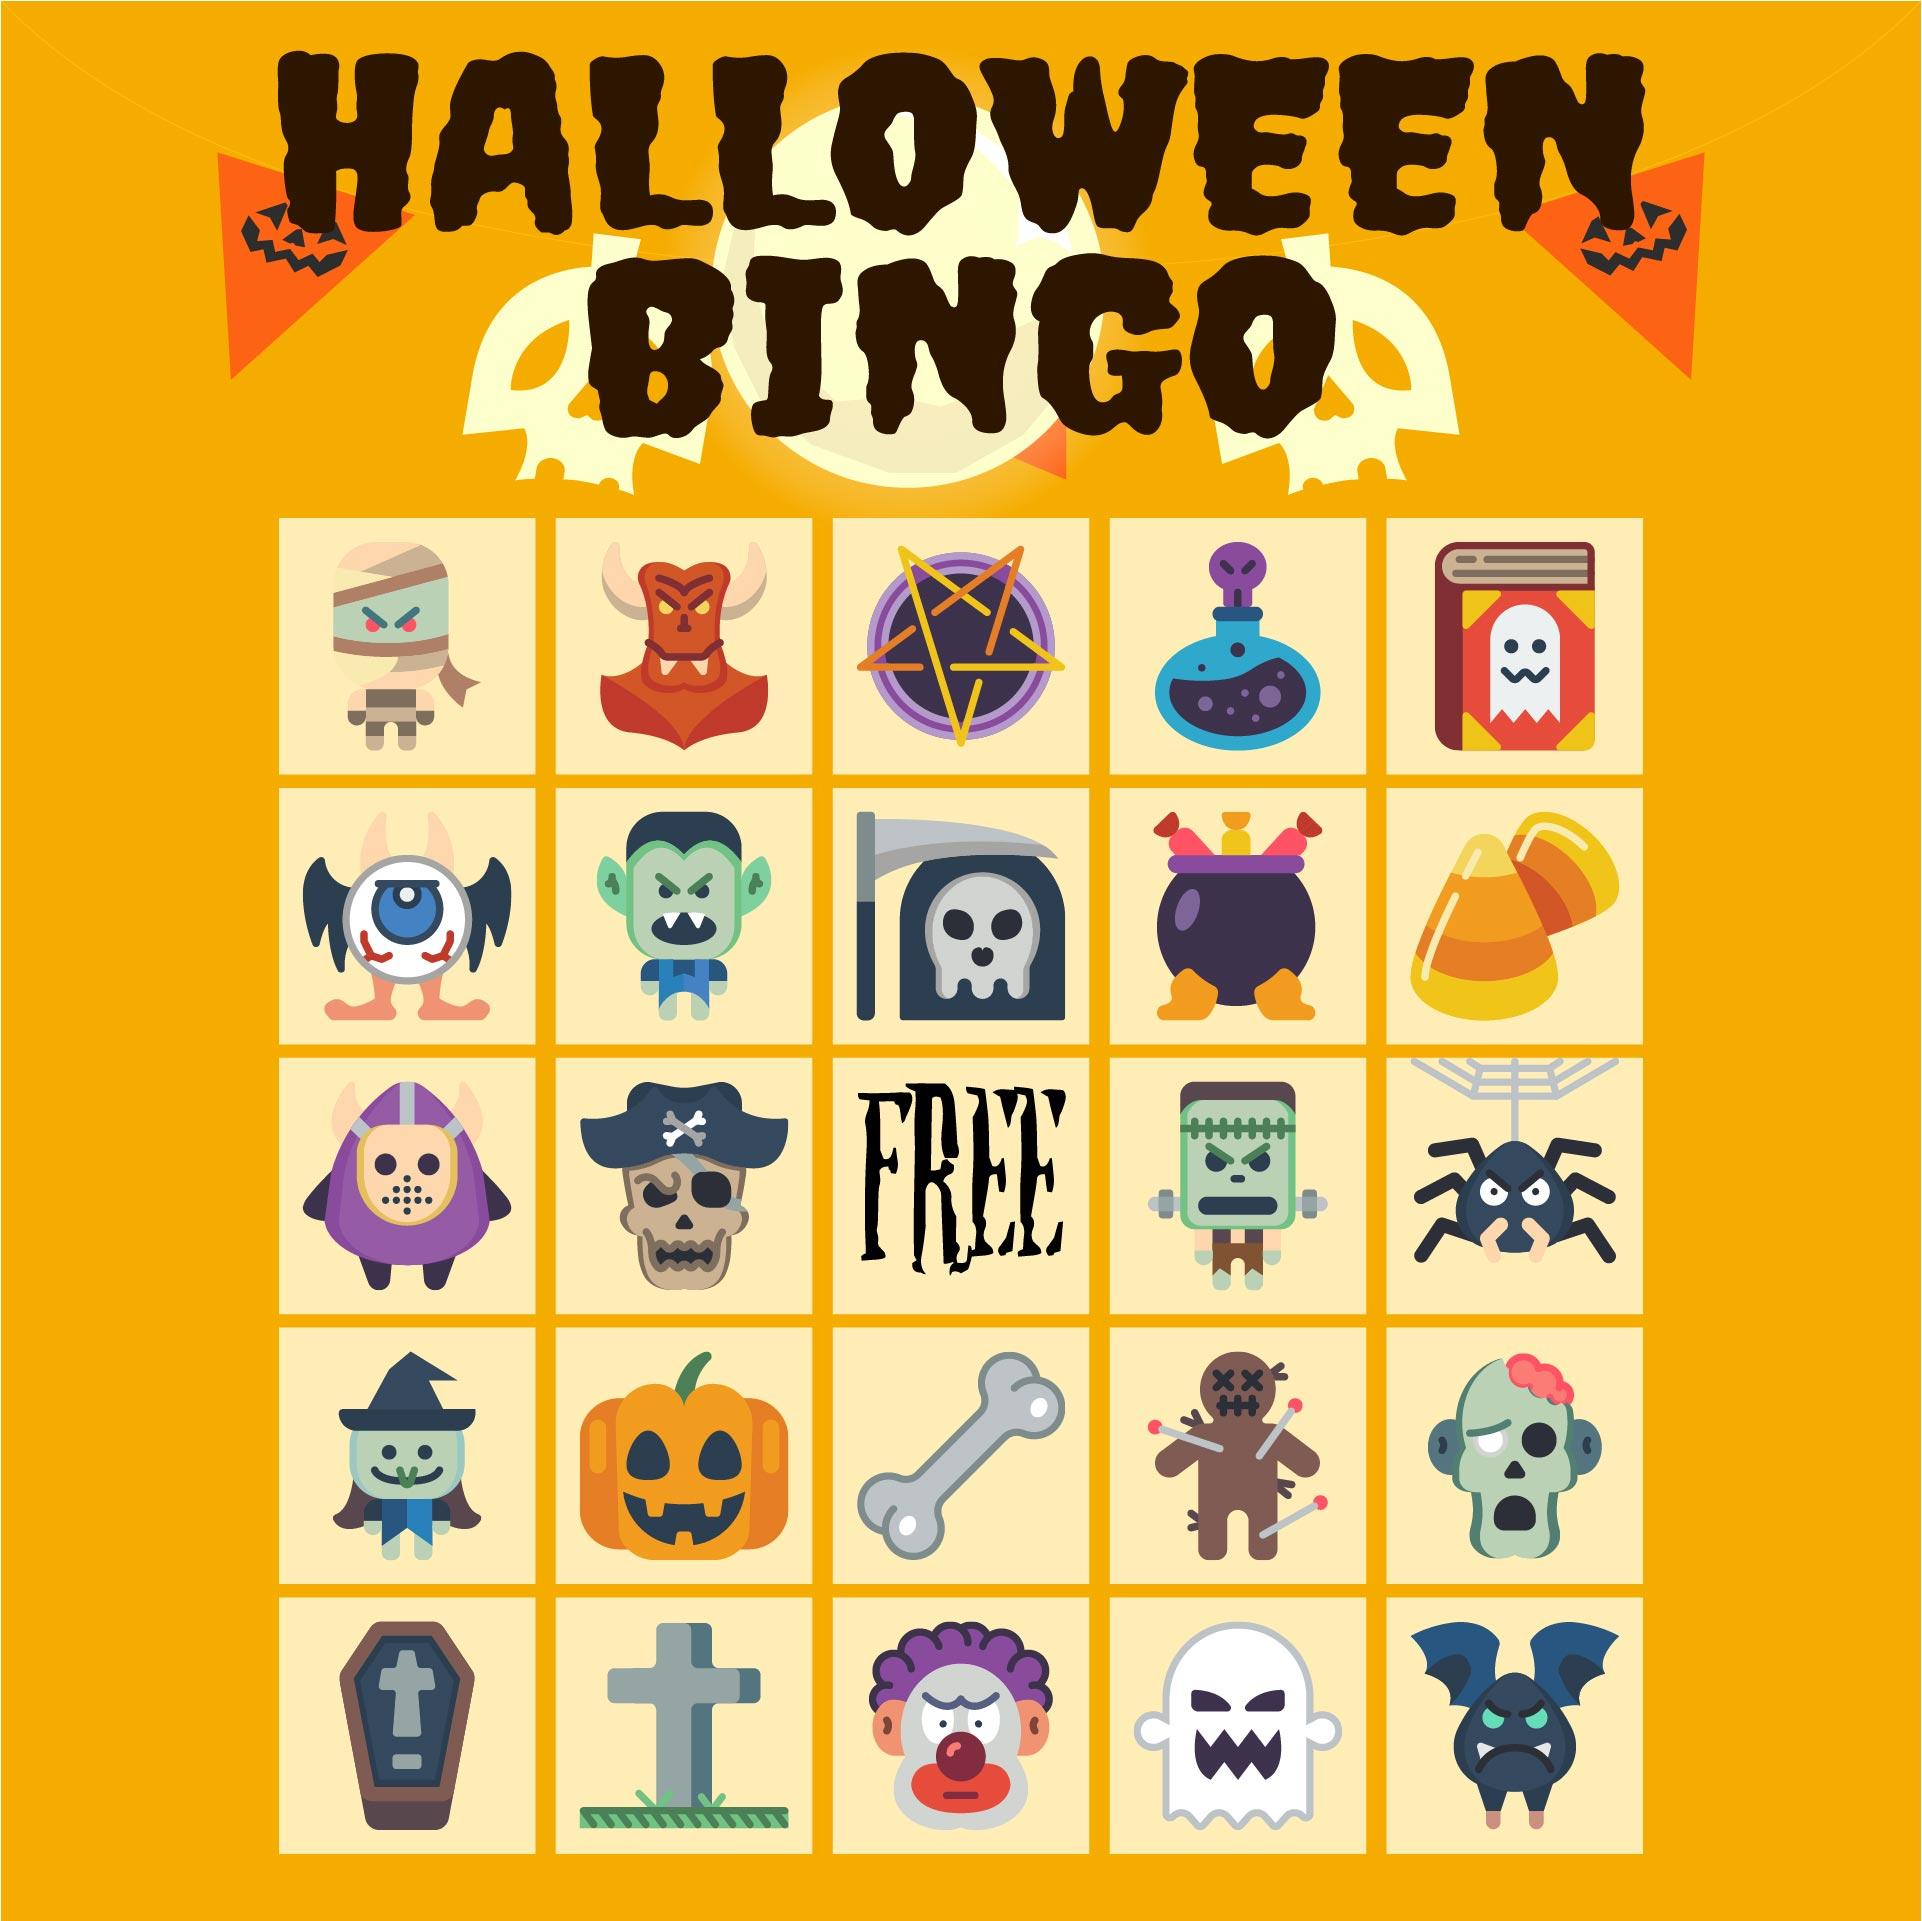 Free Printable Halloween Themed Bingo Cards